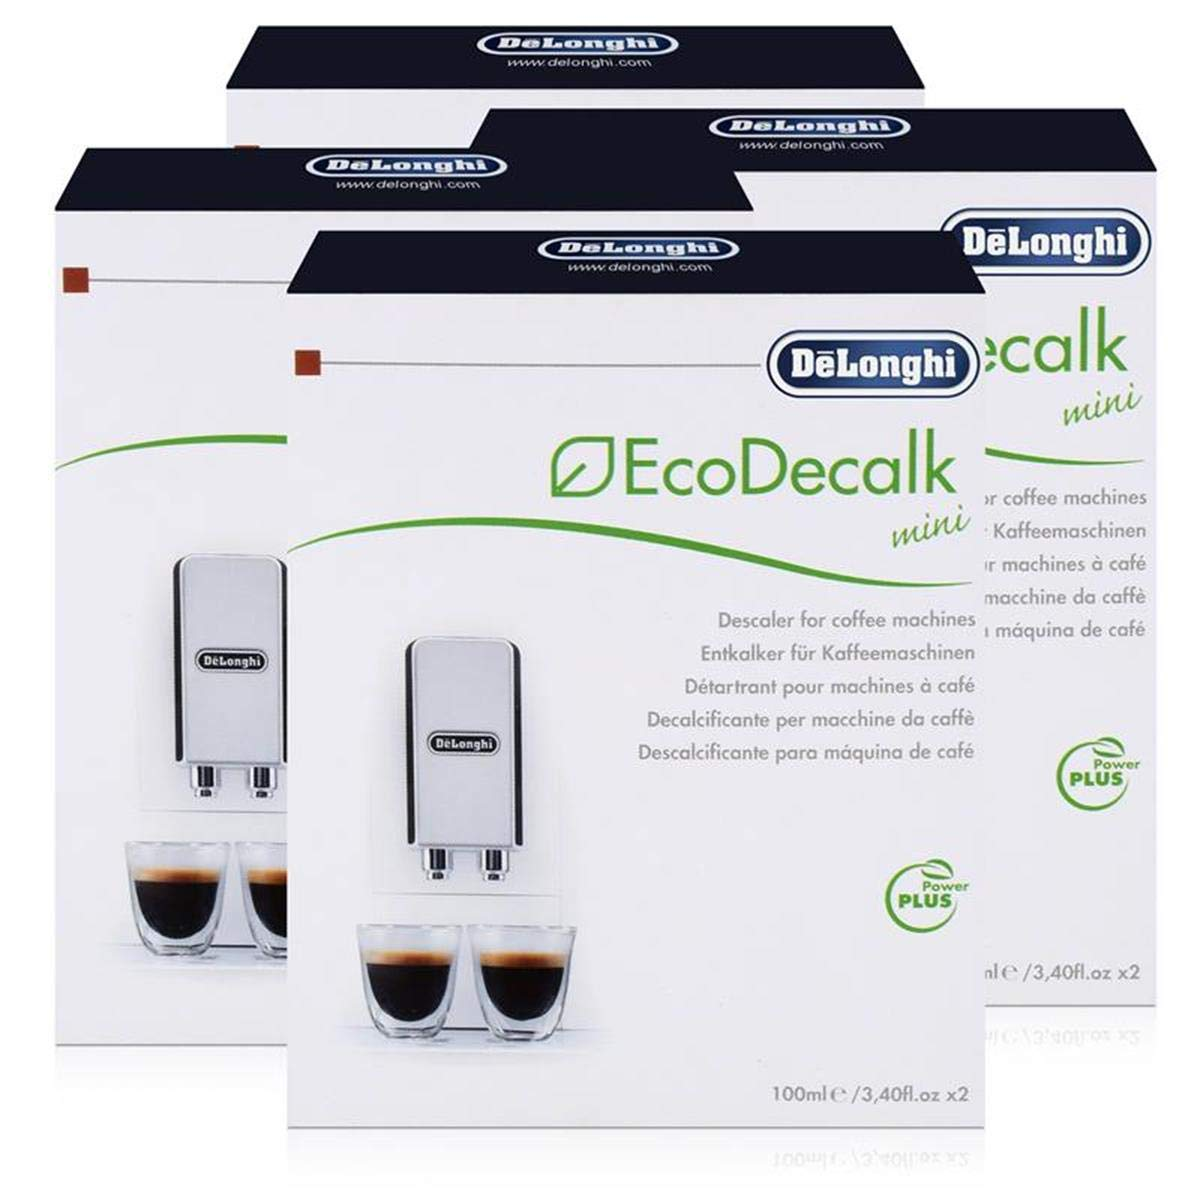 Delonghi Descaler Ecodecalk 2 x 100ml (Pack of 4)